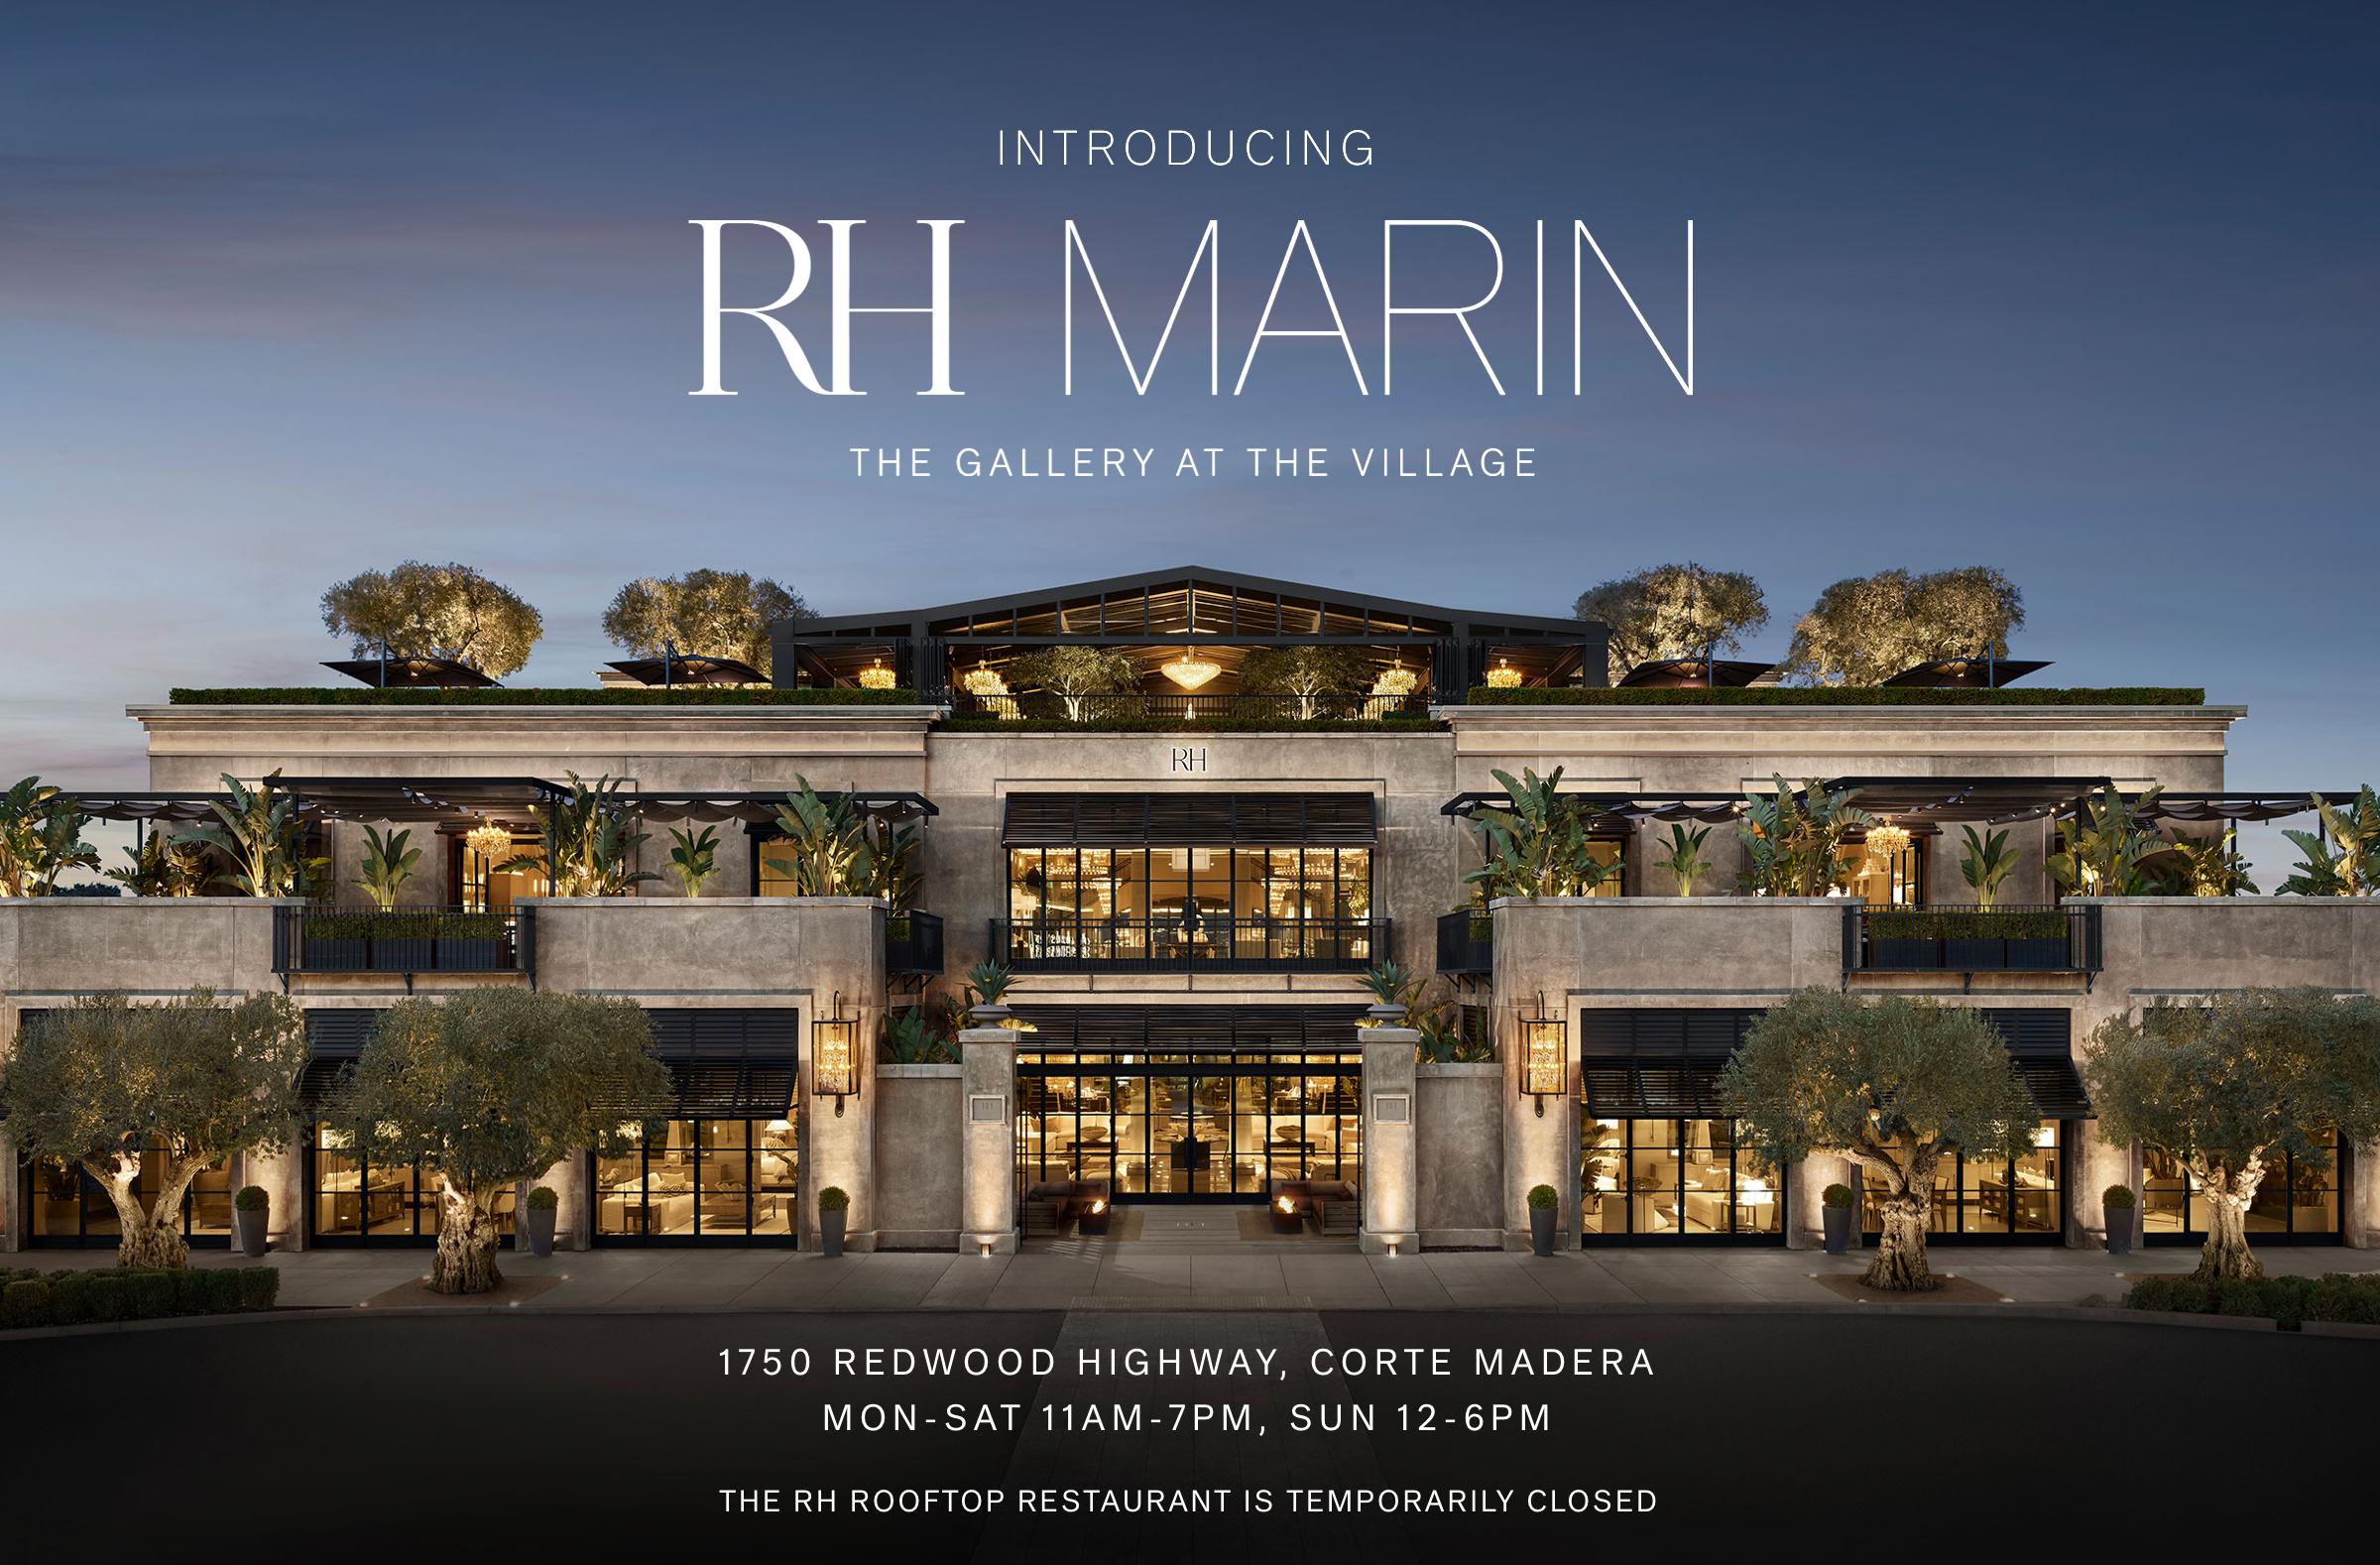 RH MARIN gallery at The Village